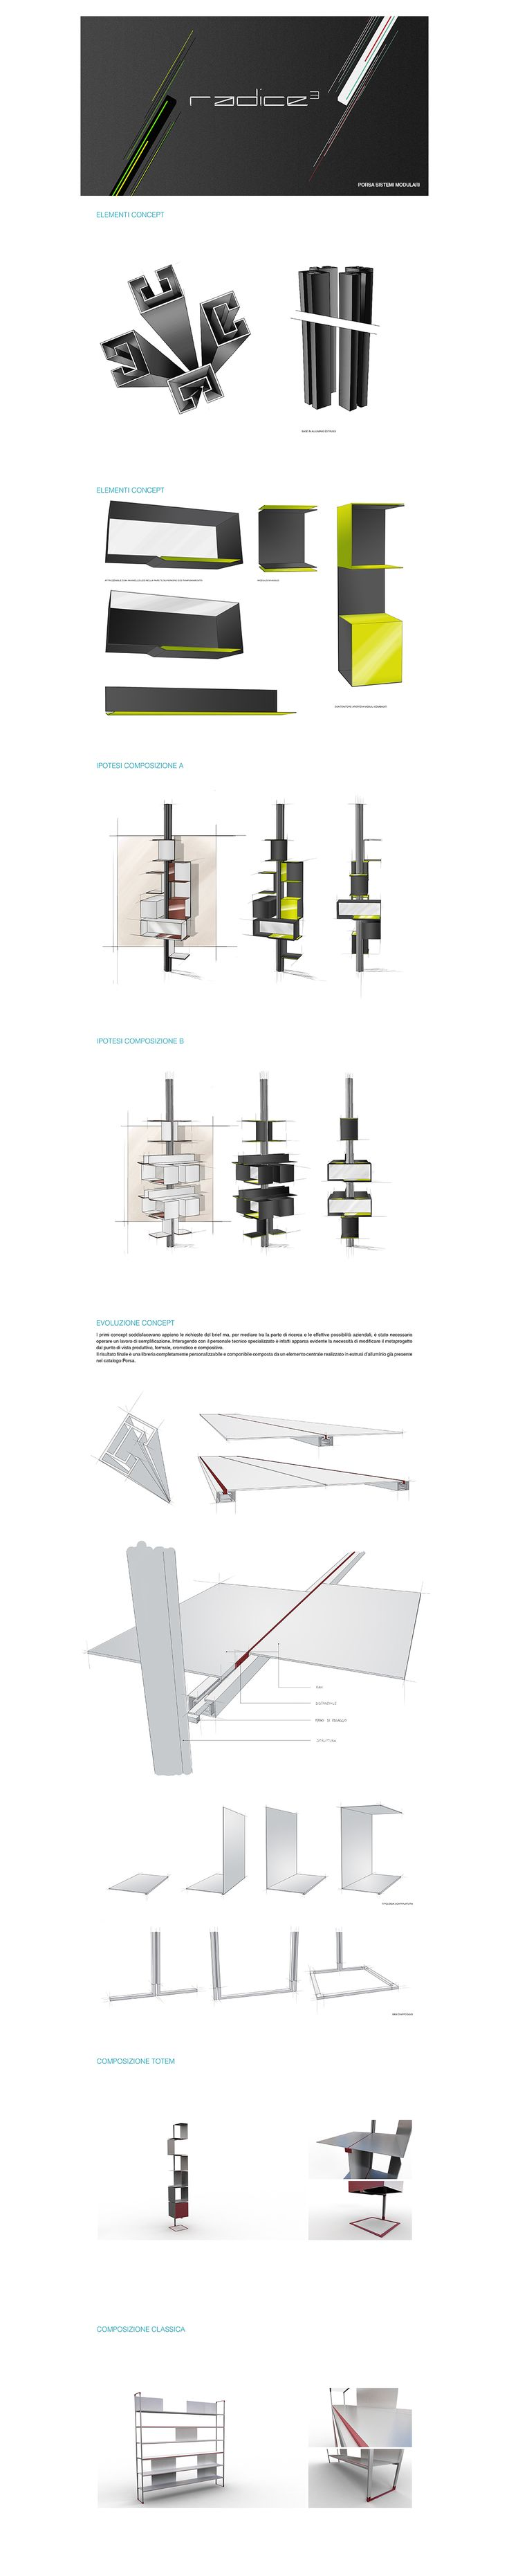 Furniture Design by Porsa